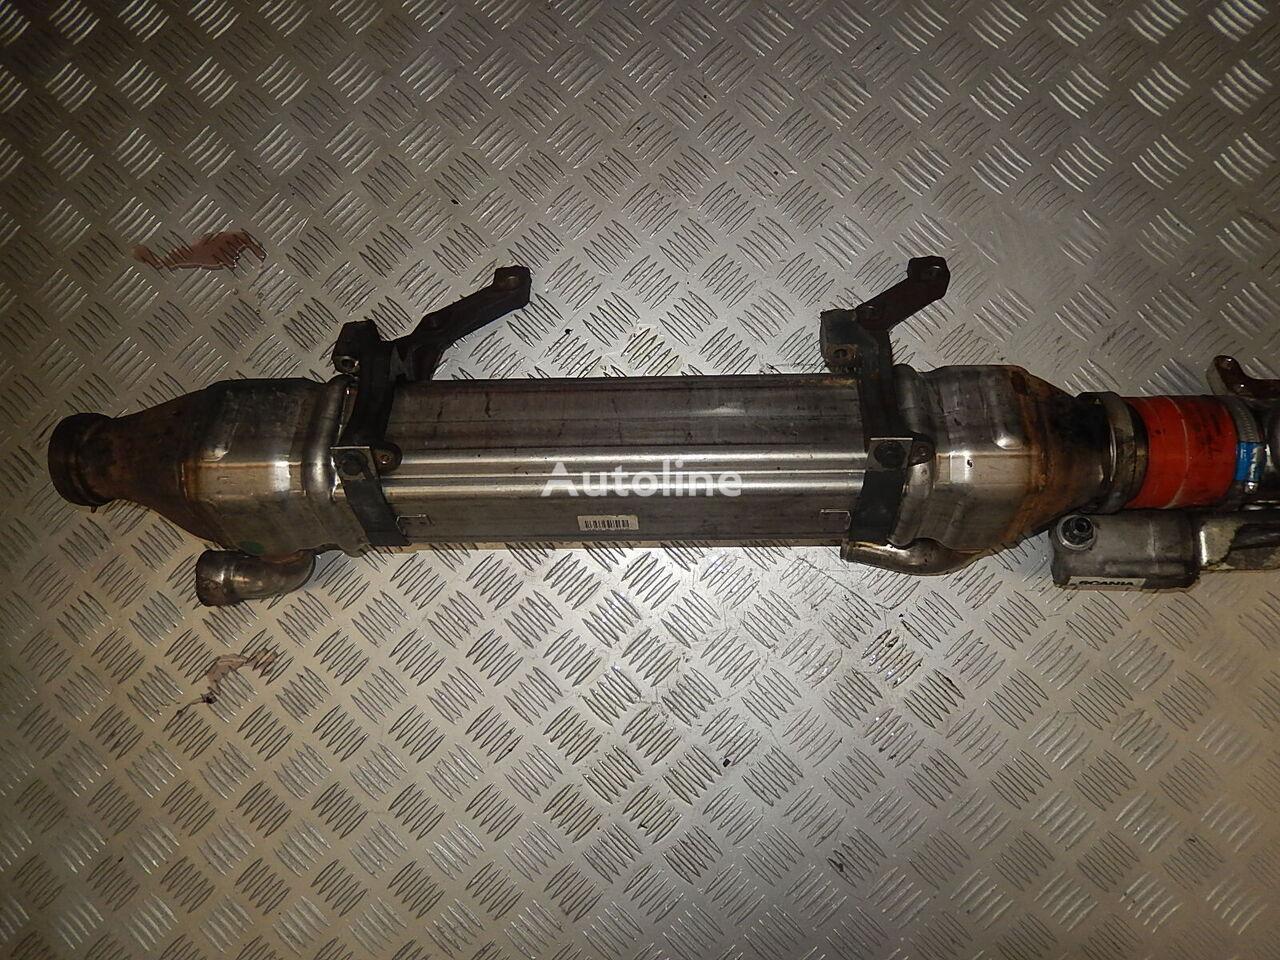 SCANIA Racitor EGR / / 1795704 (1795704) recirculación de gases de escape para SCANIA G tractora